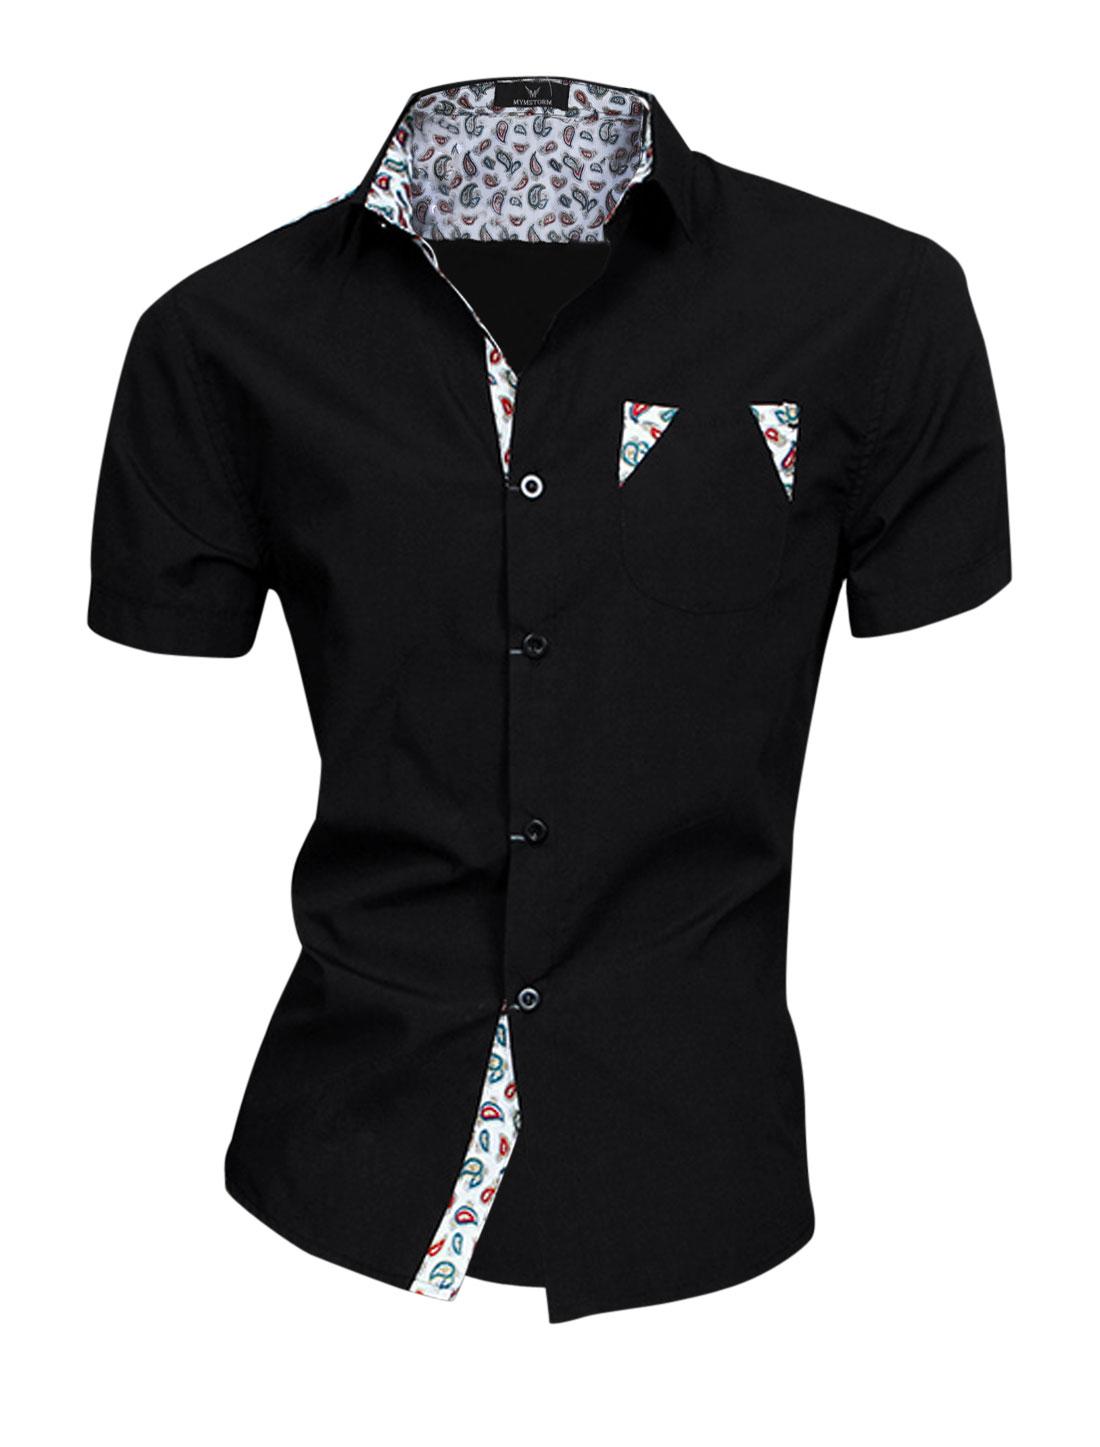 Men Paisleys Pattern Single Breast Pocket Soft NEW Top Shirt Black M